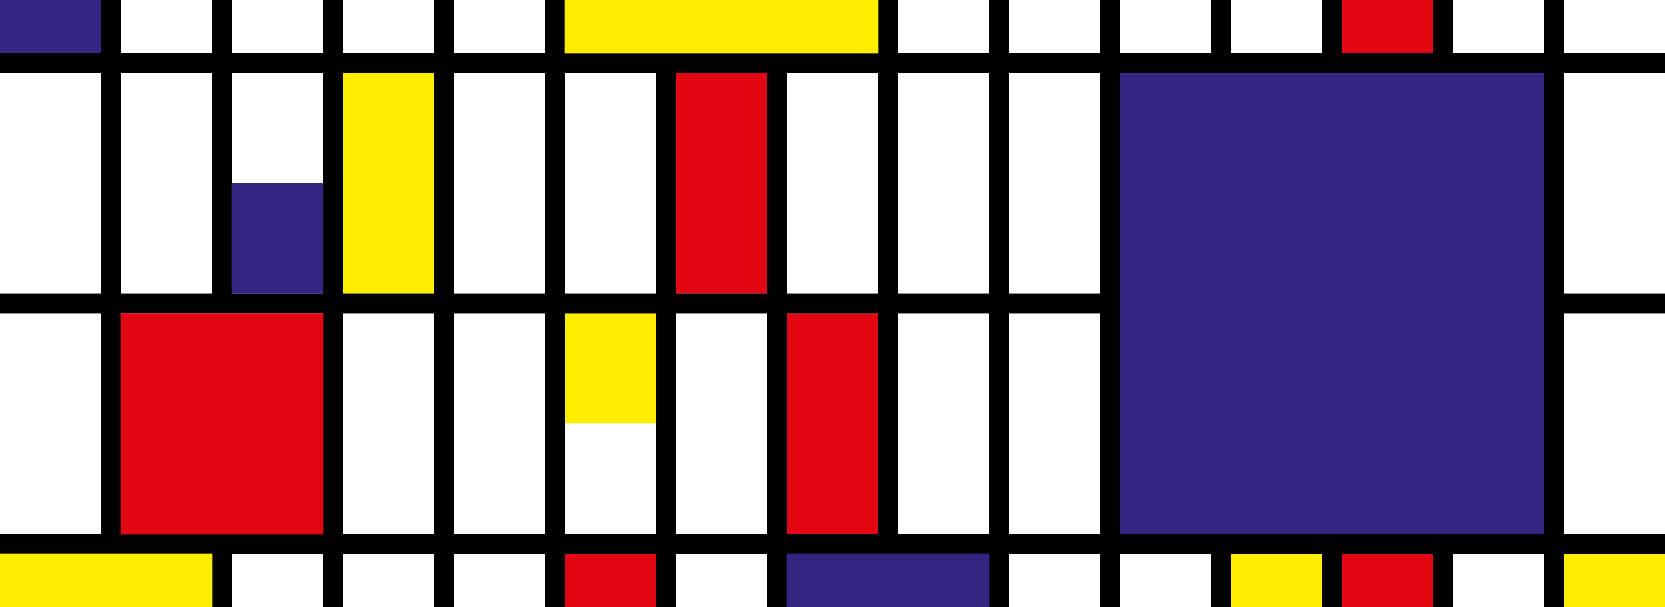 Bauhaus, Mondrian